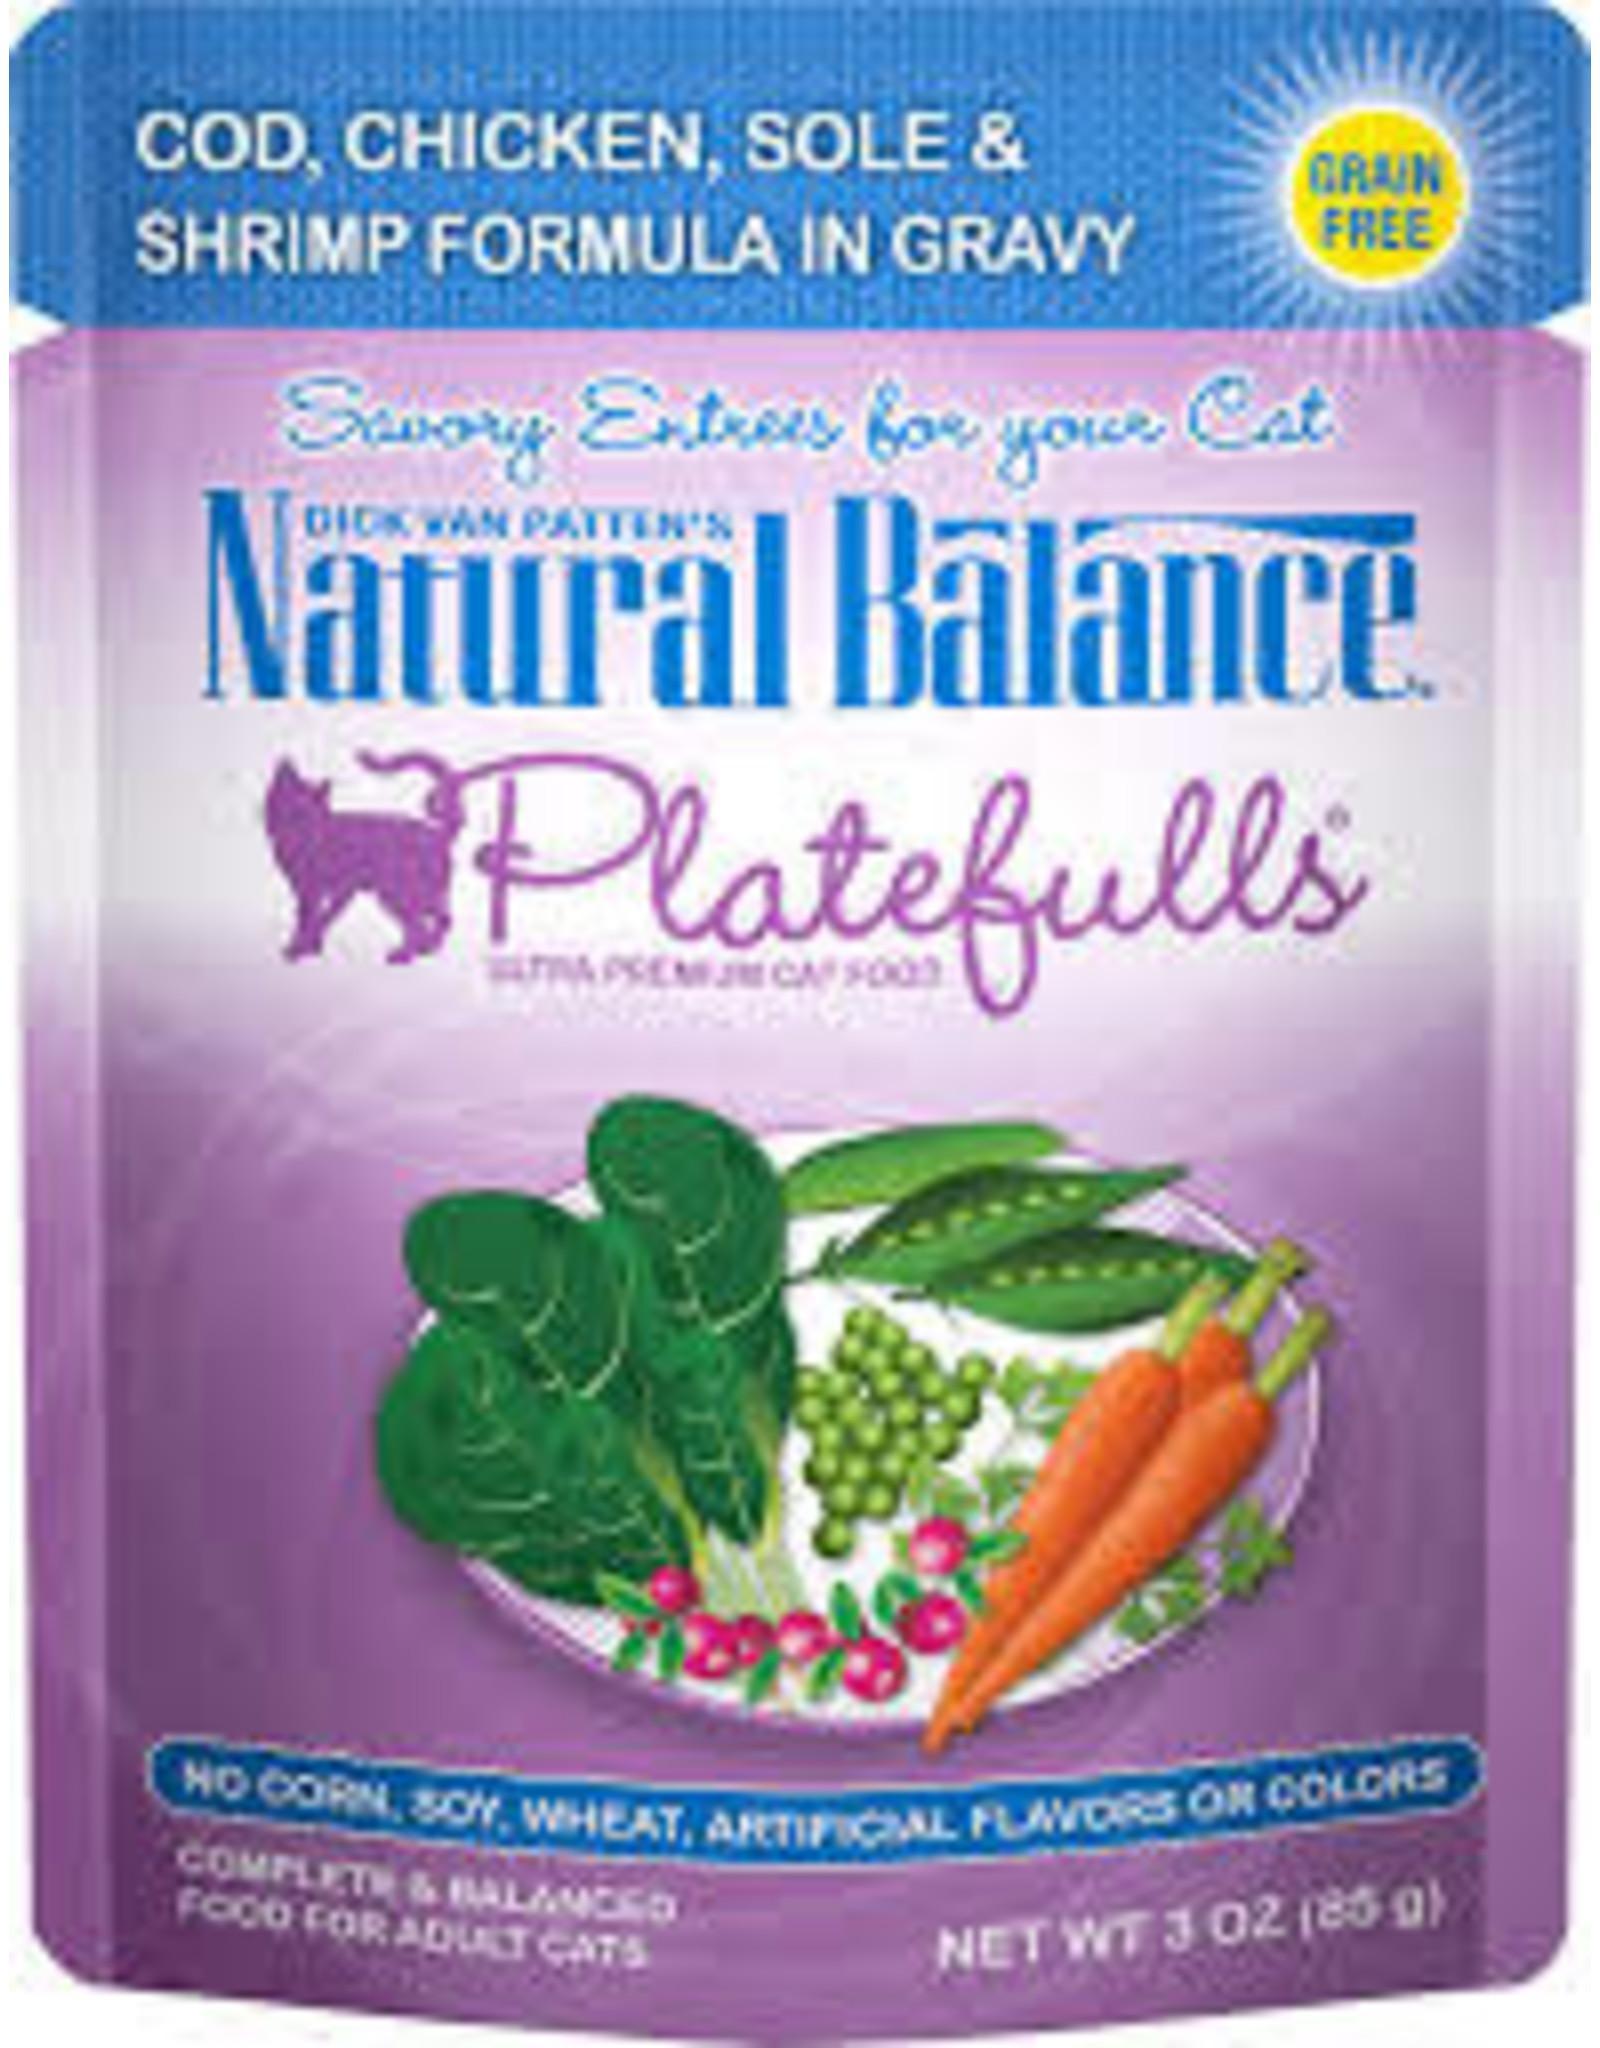 Natural Balance Natural Balance - Cod Chicken Sole Shrimp  in Gravy 3oz